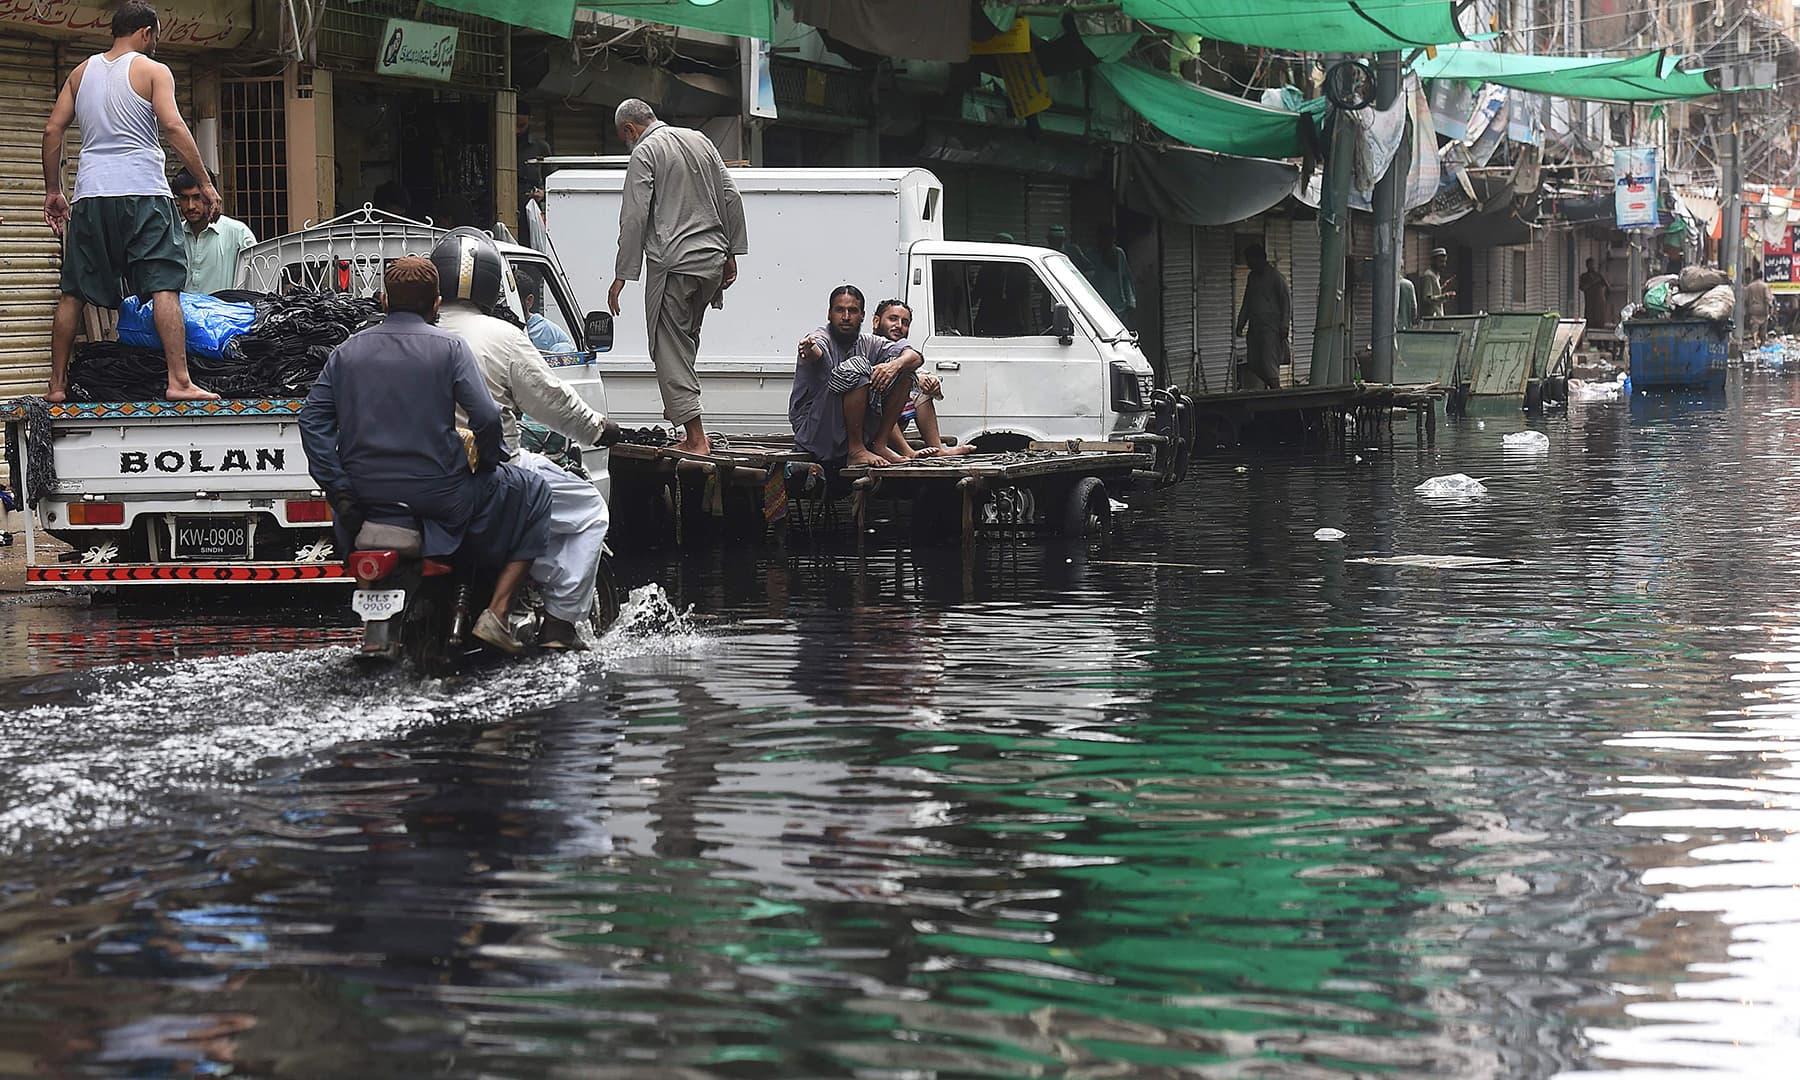 Men ride on a motorbike along a flooded street after heavy monsoon rains in Karachi on August 31. — AFP